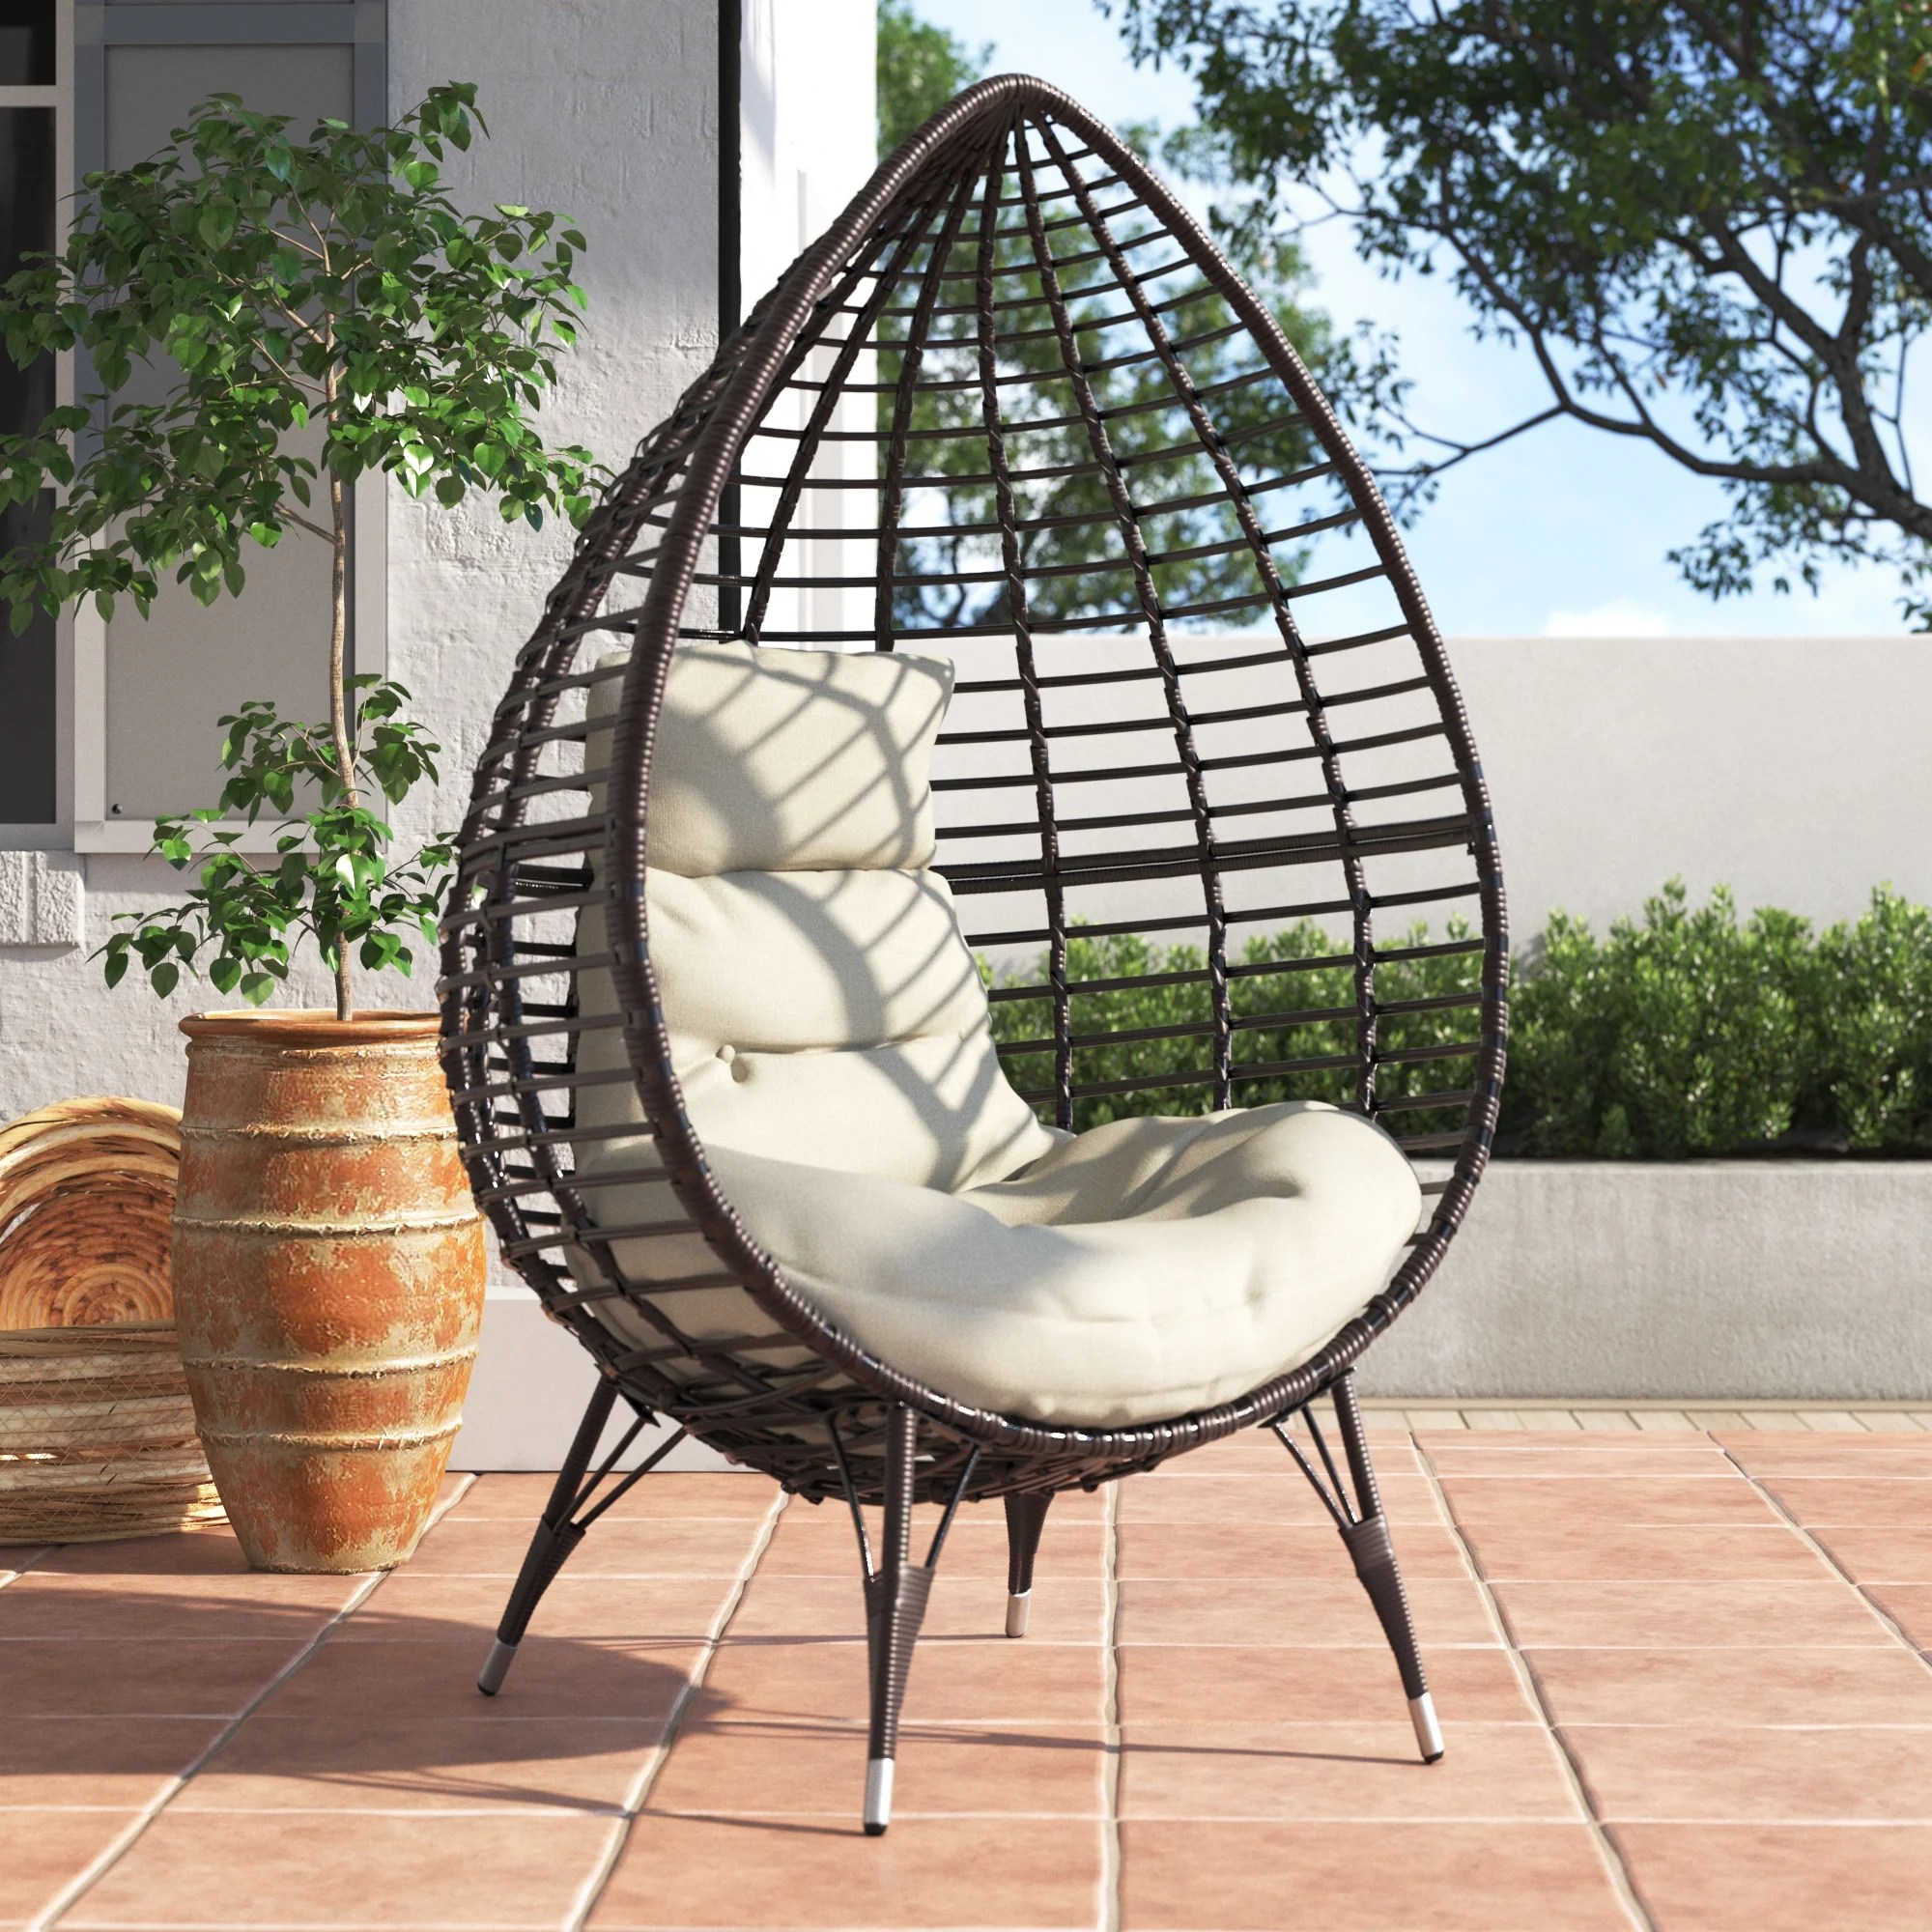 emerson teardrop patio chair with cushions